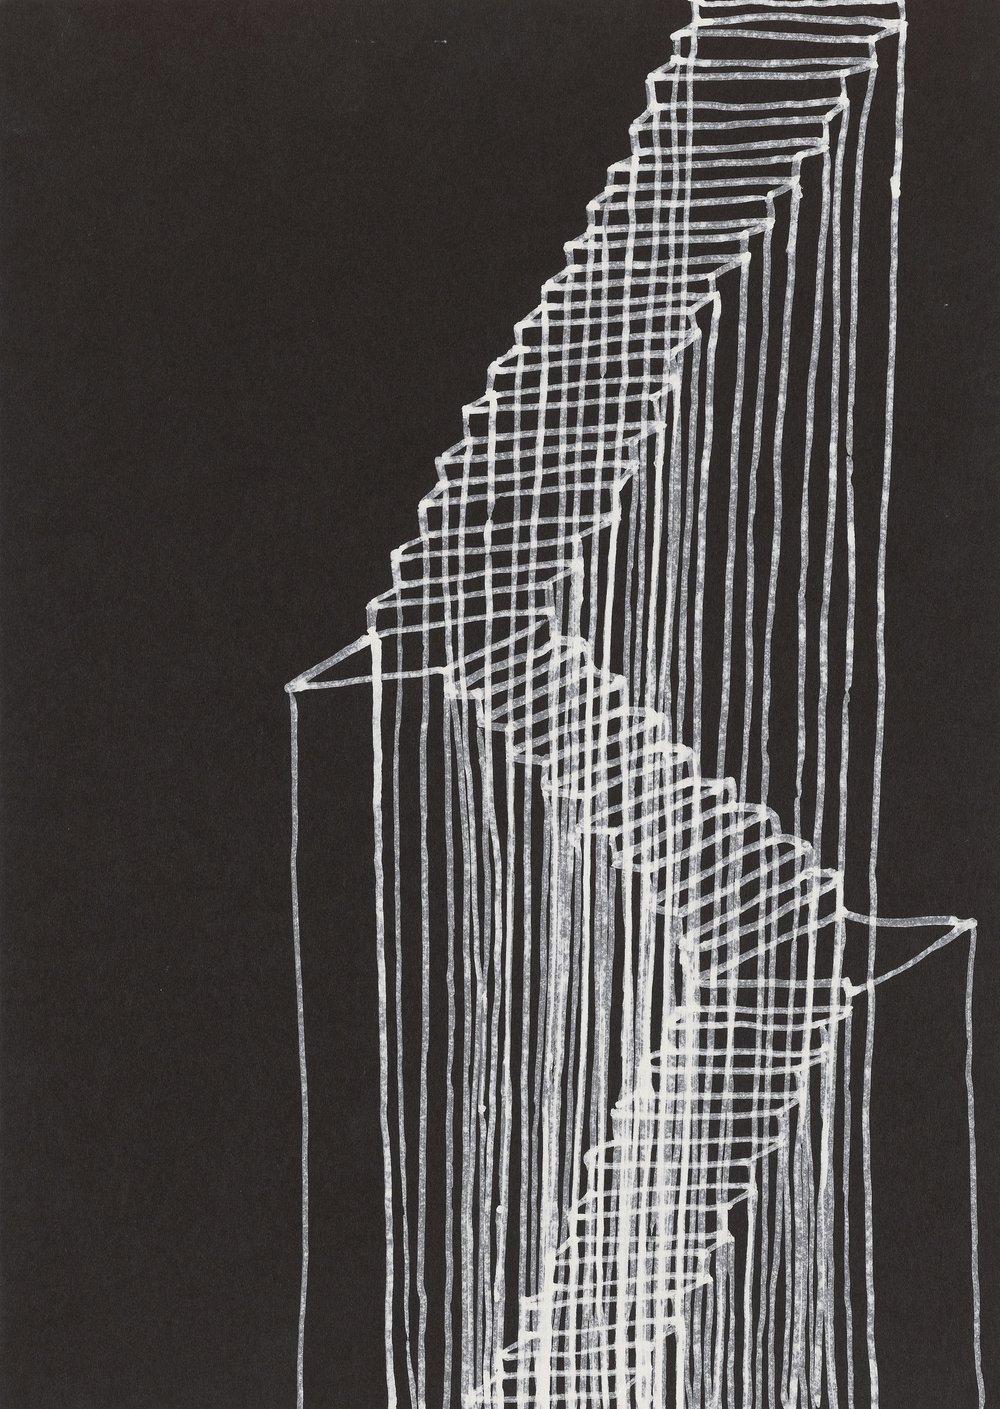 Rachel Whiteread,Stairs, 1995 © Rachel Whiteread | Courtesy of the artist and Gagosian -